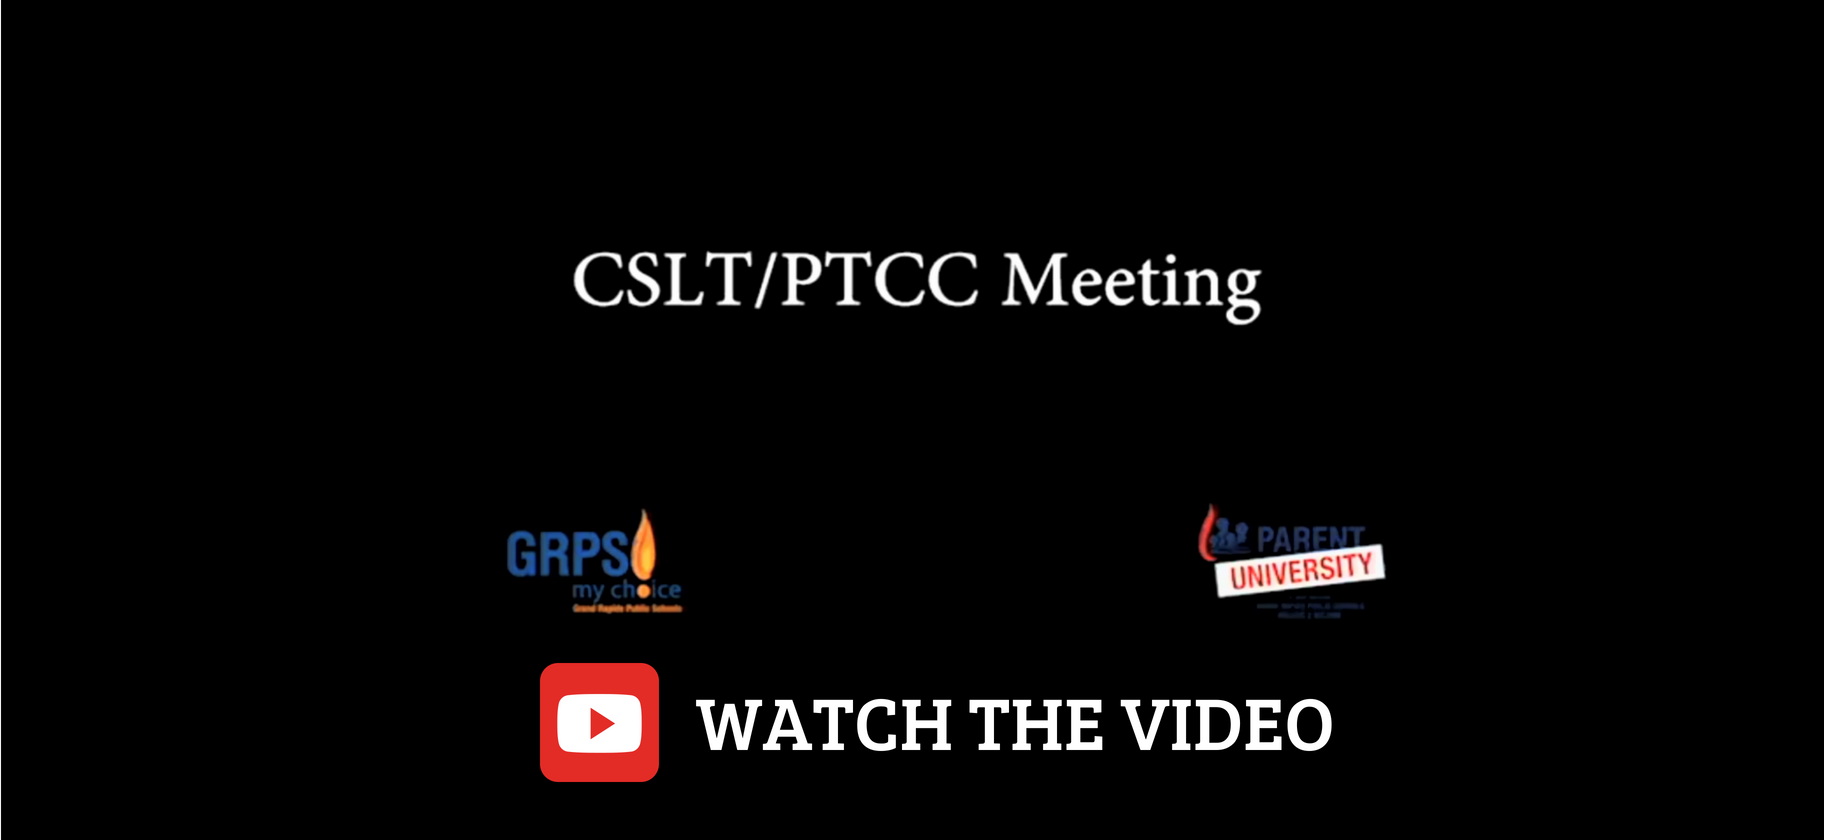 CSLT/PTCC Meeting